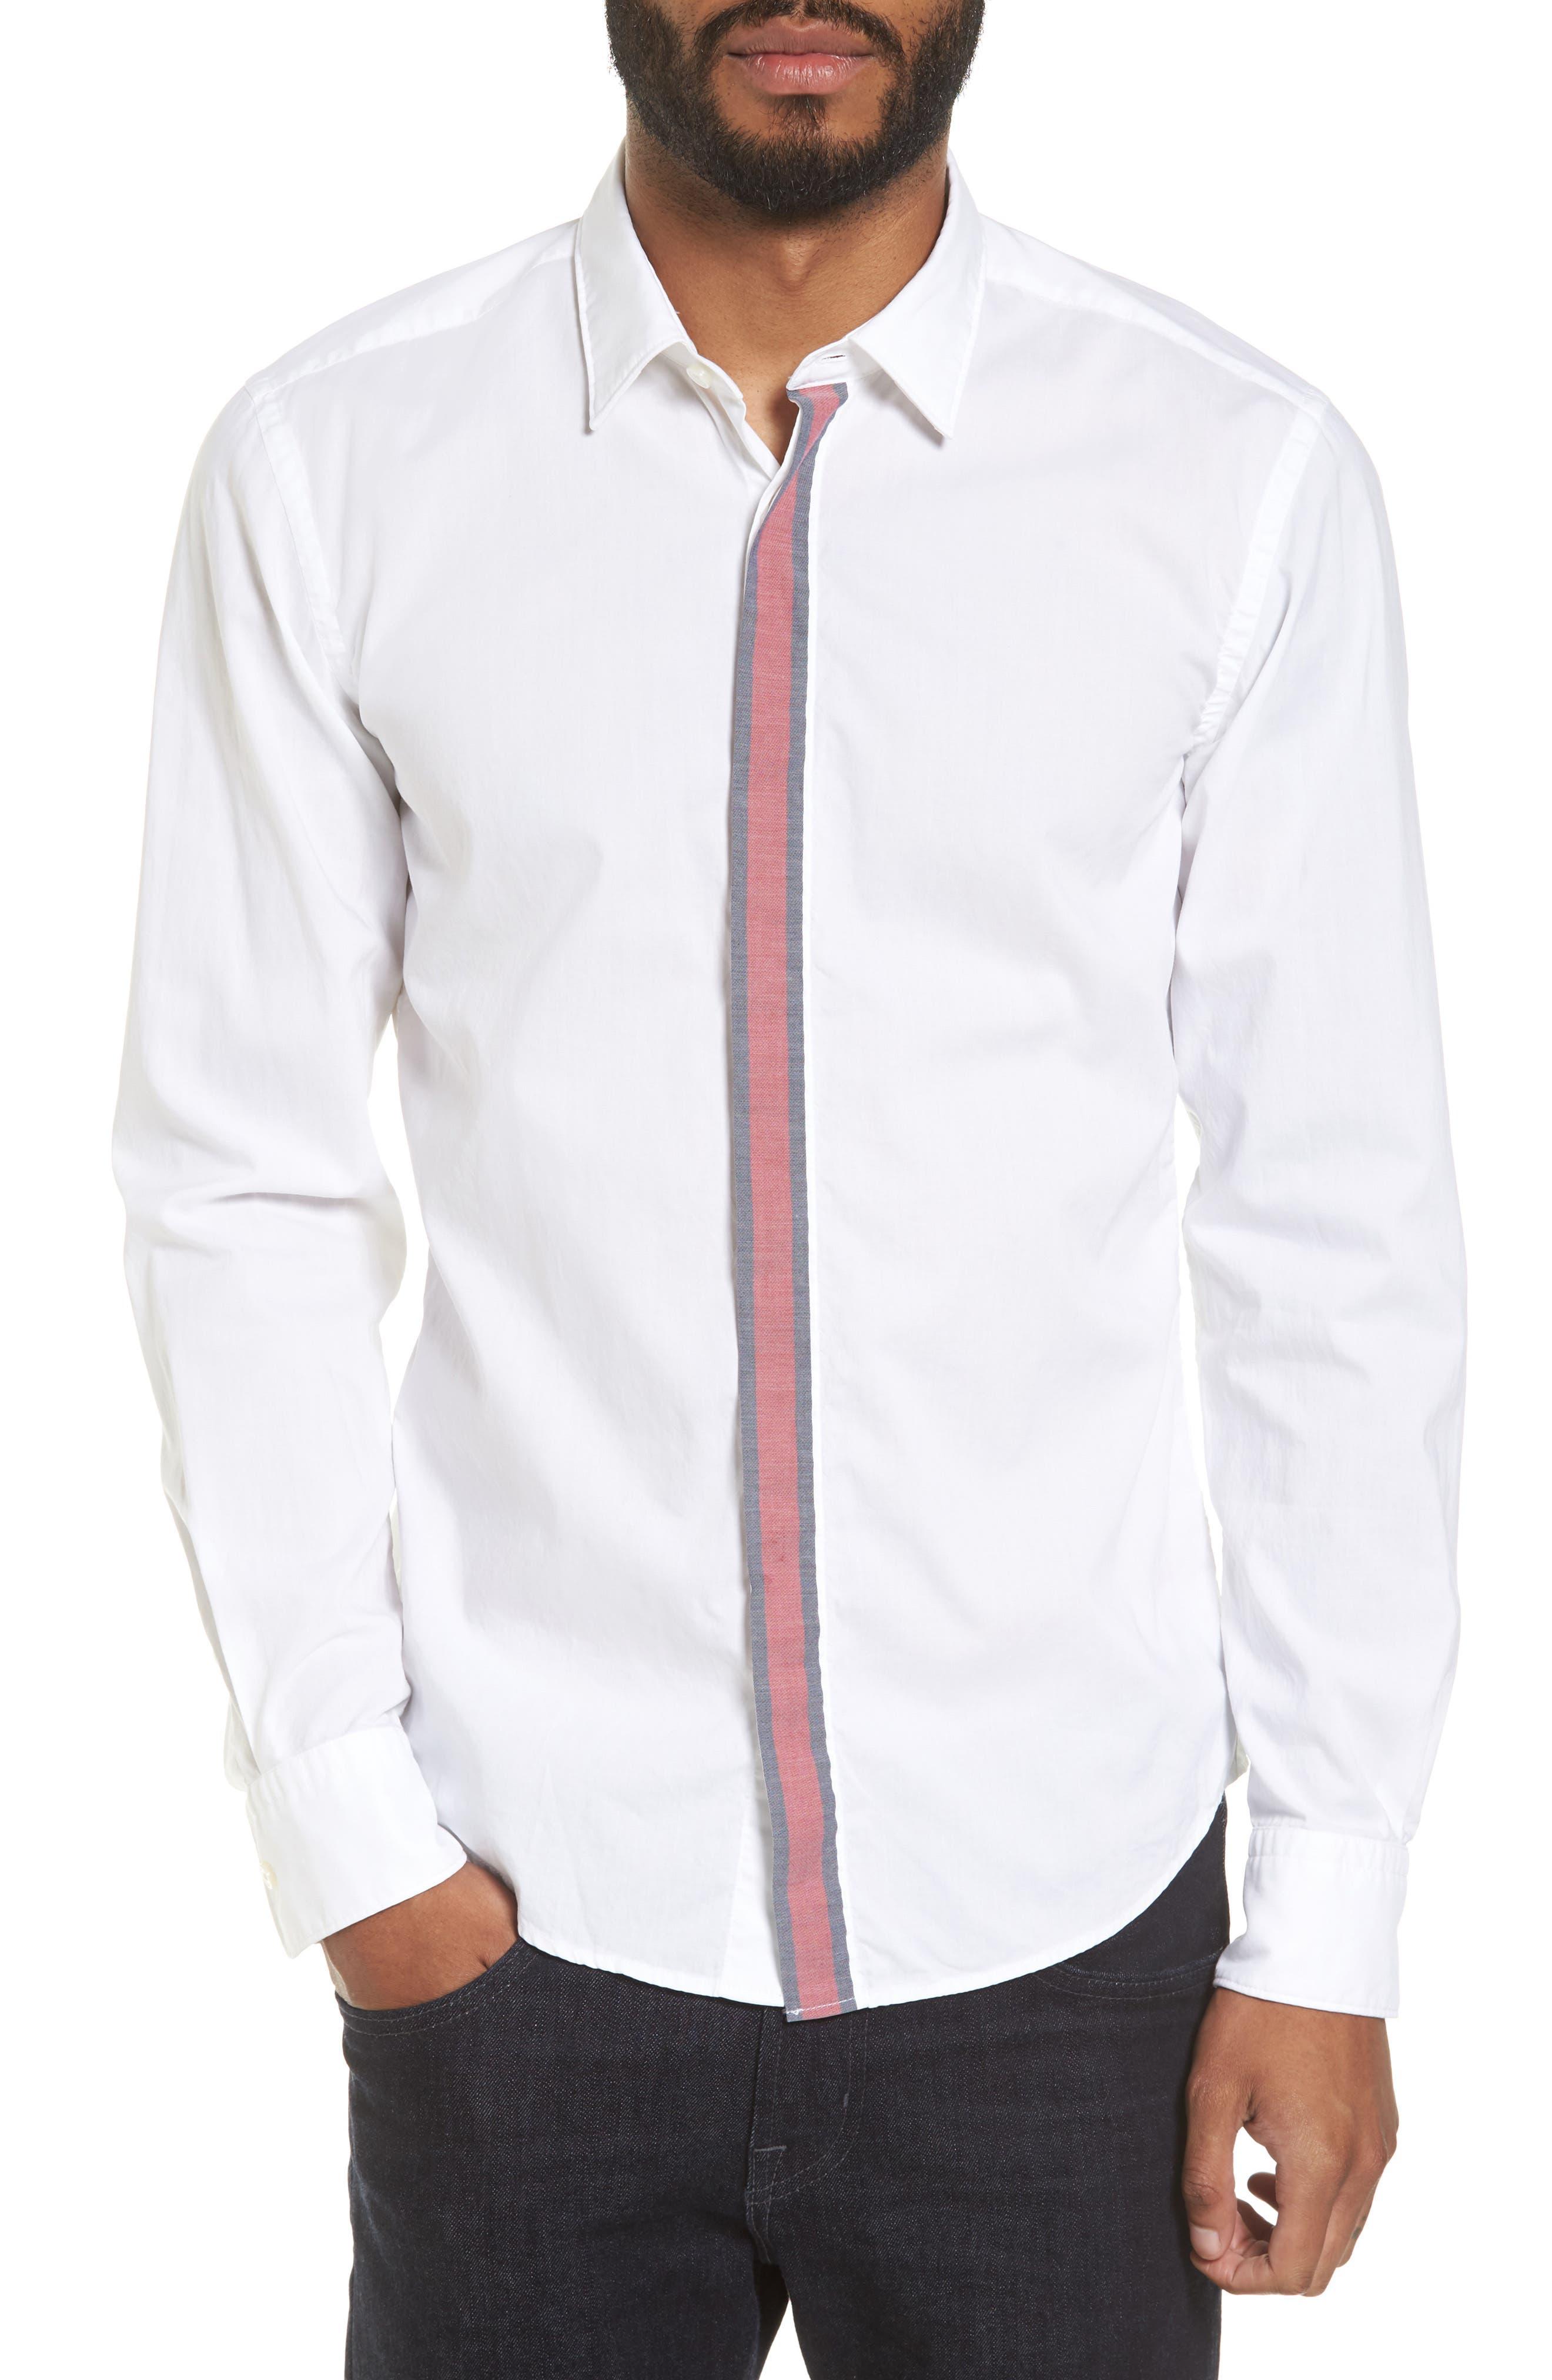 Main Image - BOSS Reid Slim Fit Contrast Placket Sport Shirt